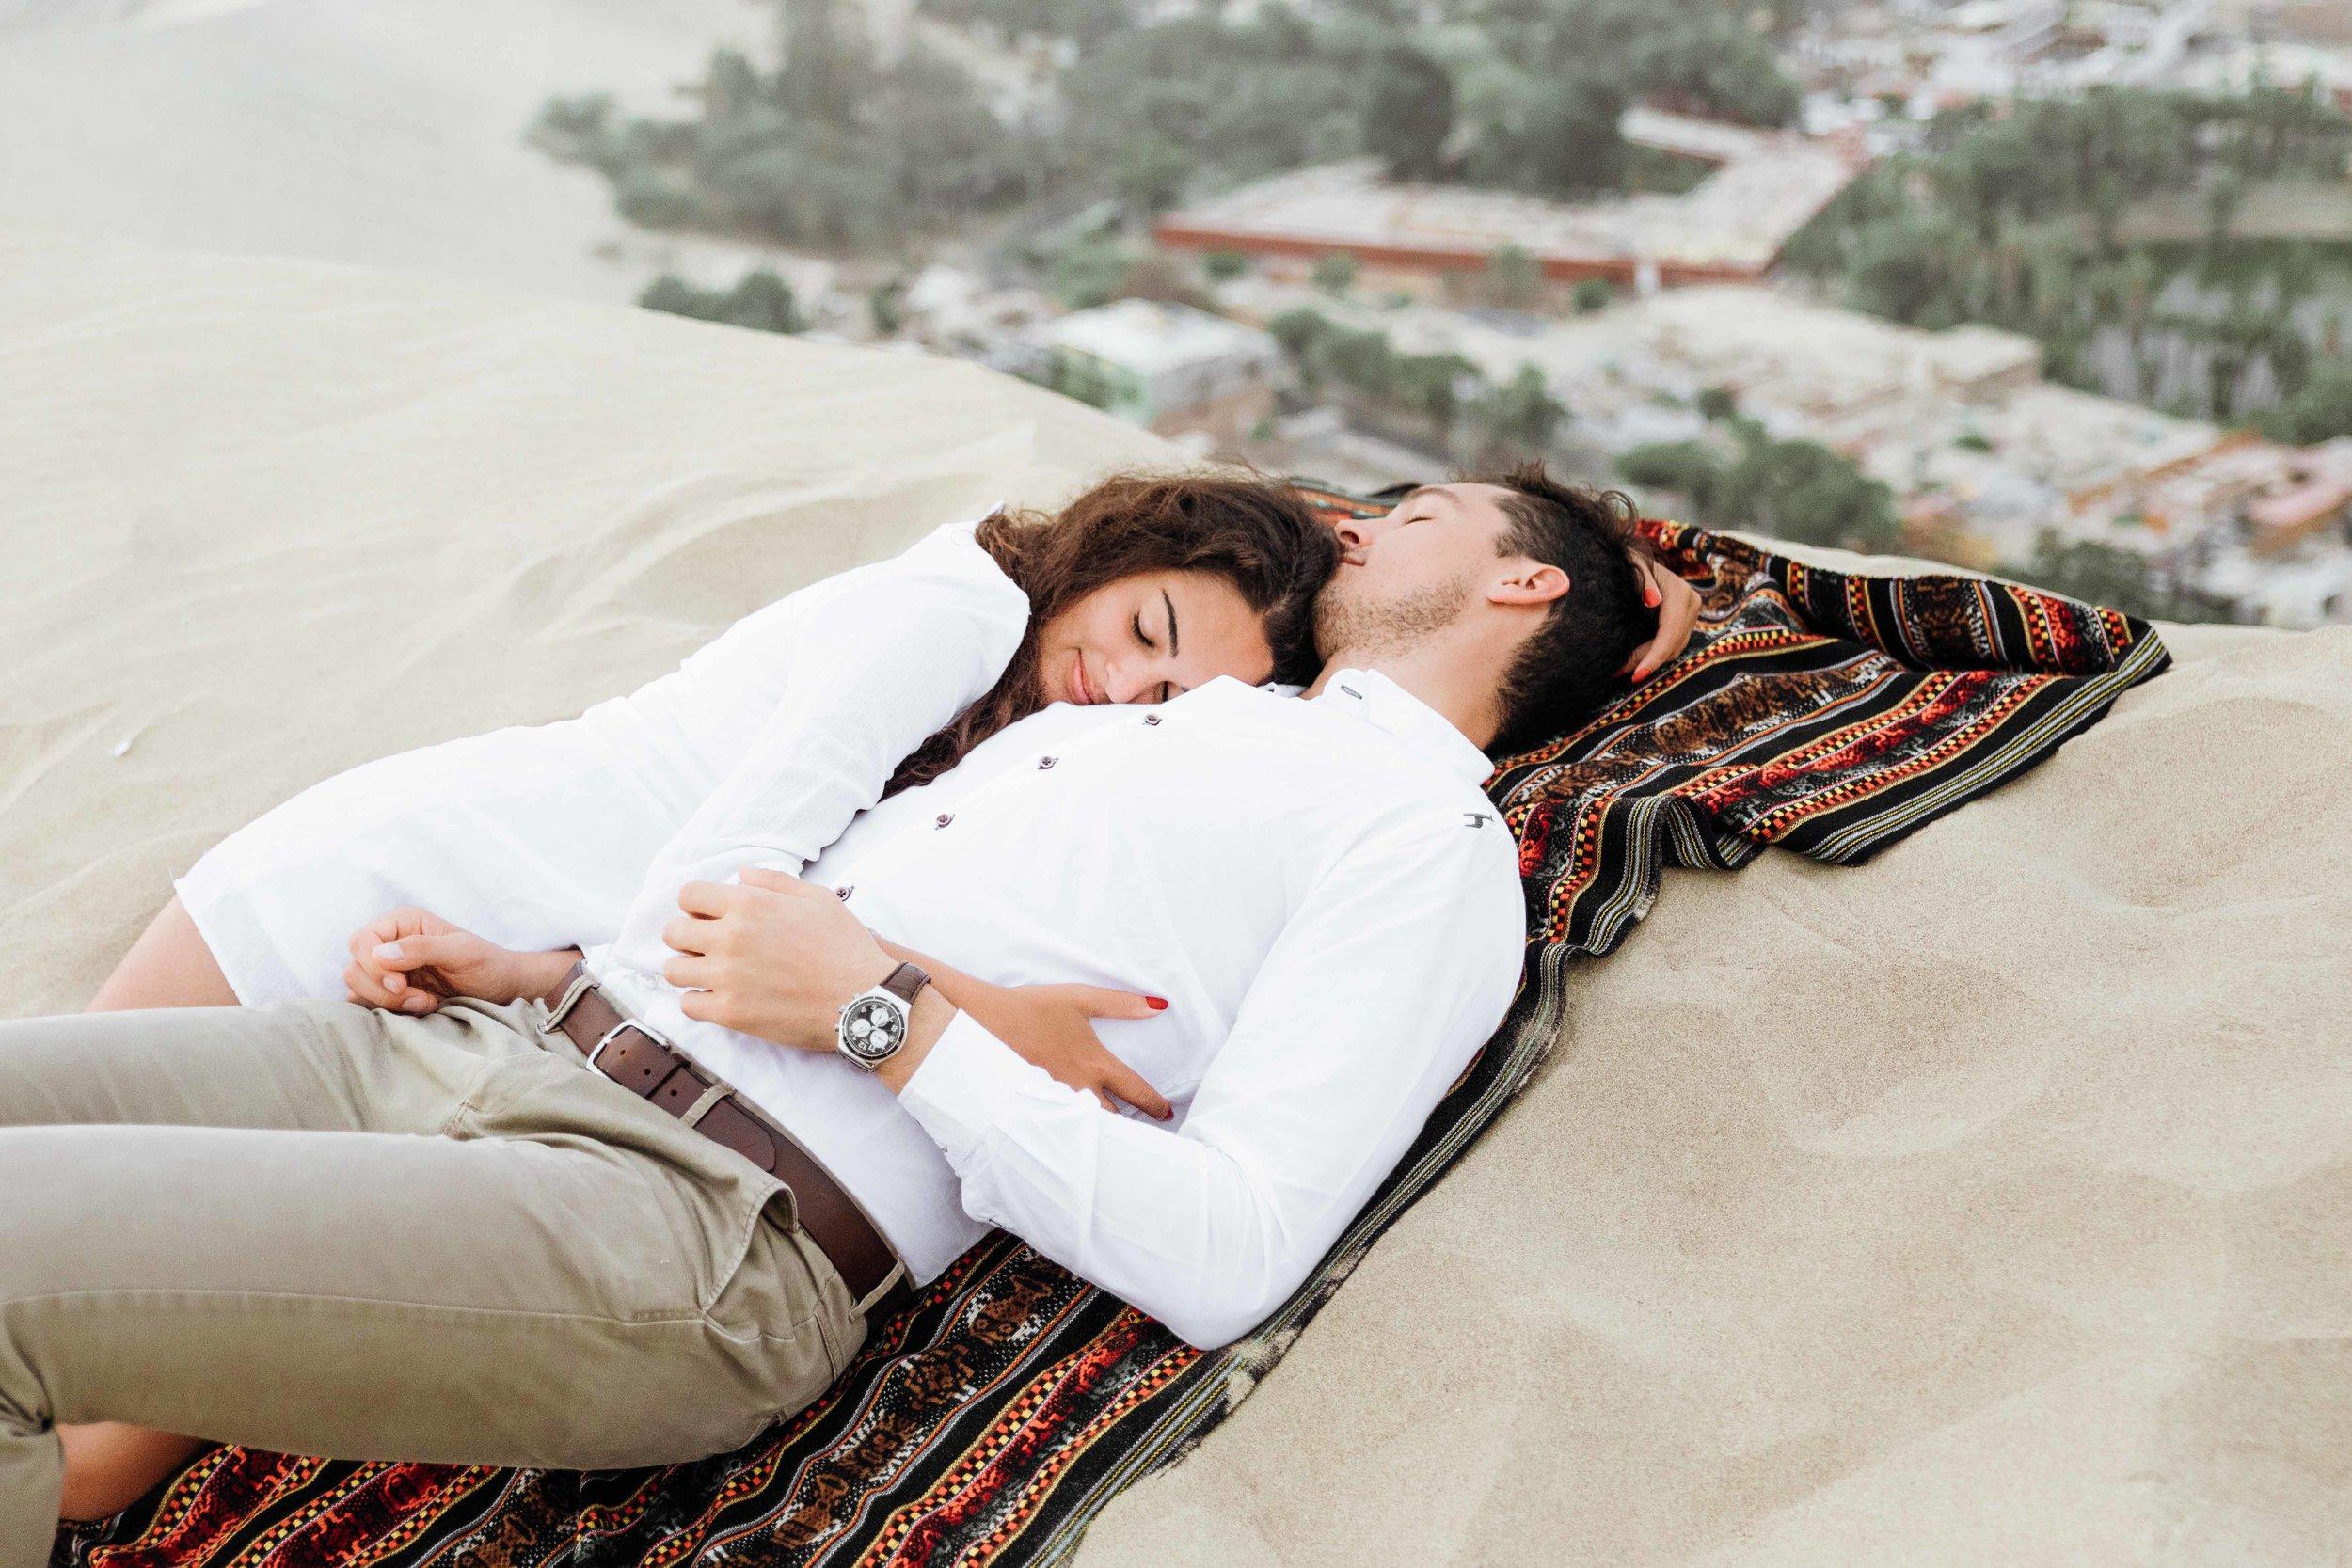 huacachina-peru-honeymoon-elopement-destination-wedding-photography-michael-cozzens-20.jpg